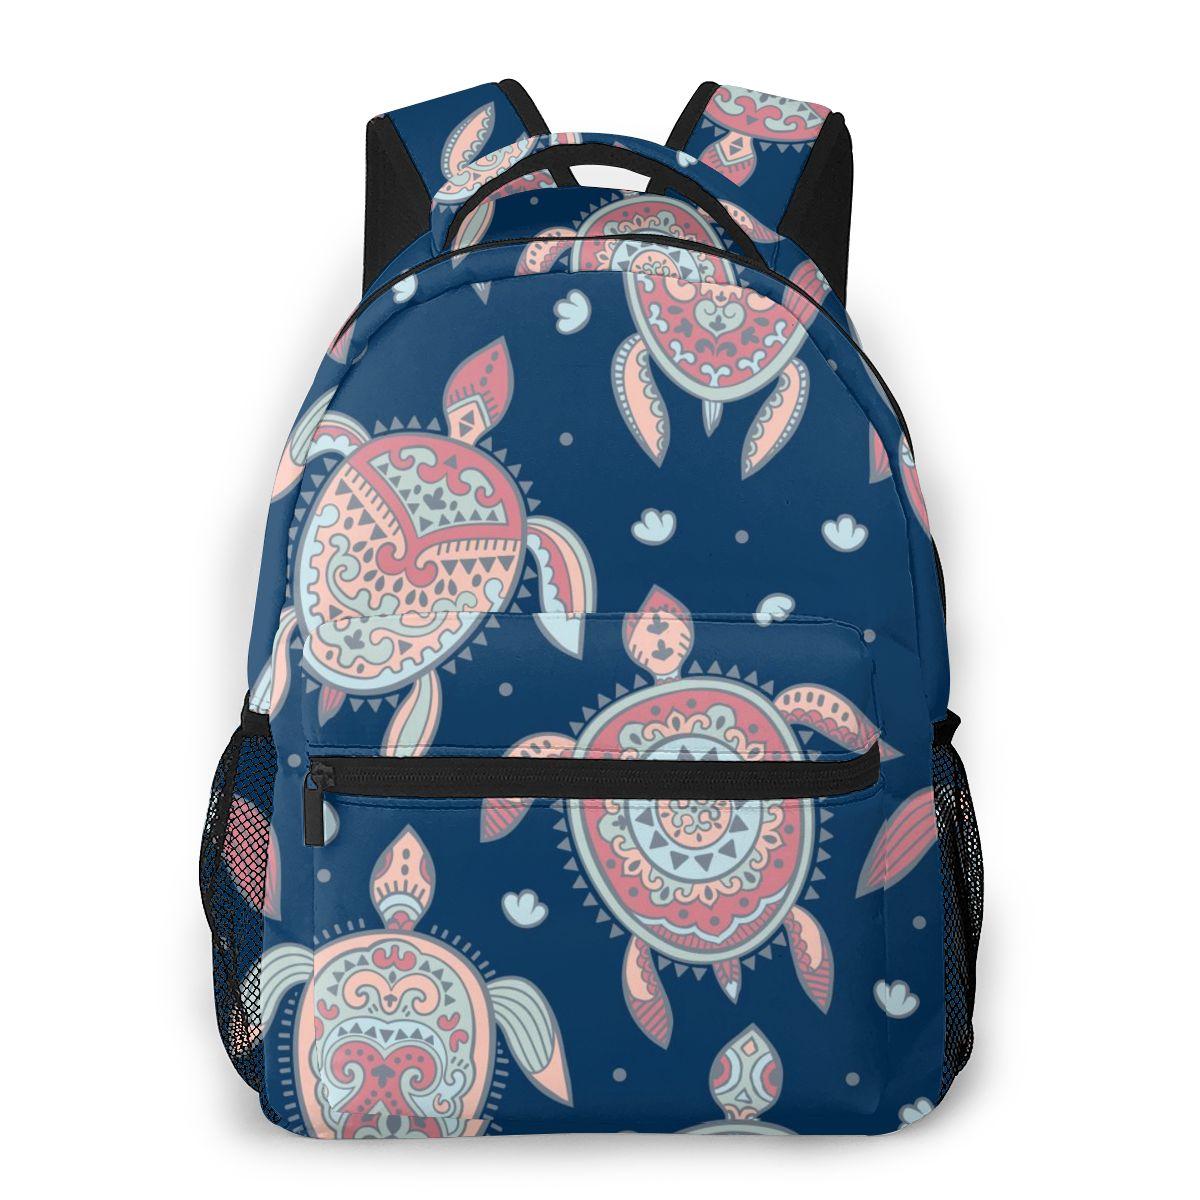 OLN-mochila para mujer, bolso de hombro Tribal con diseño de tortuga Mandala, para escuela, para adolescentes, 2020